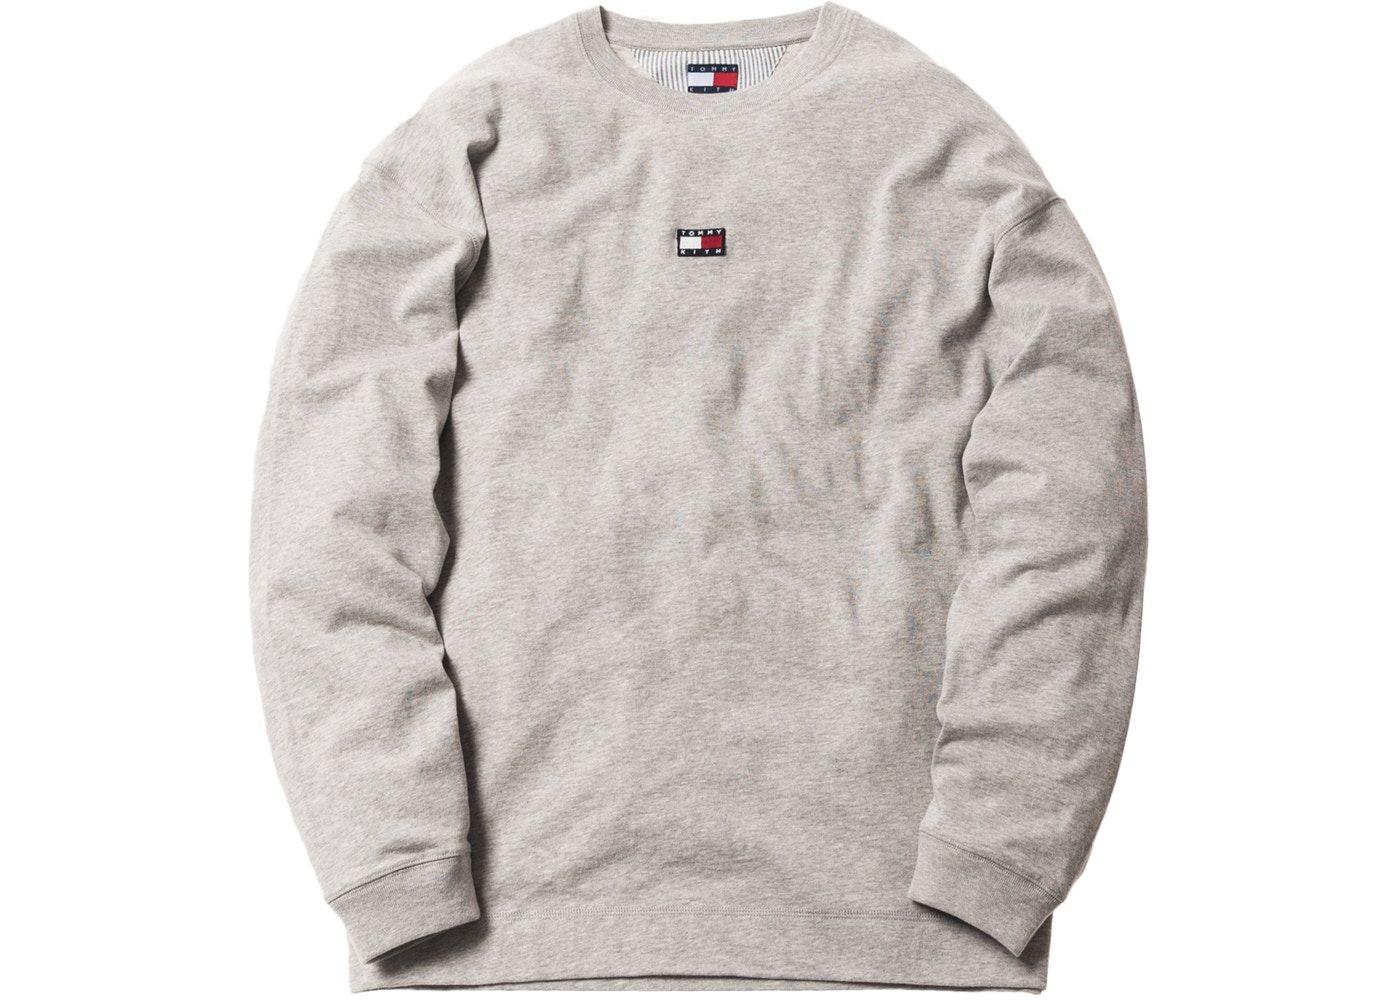 166fecfb Kith x Tommy Hilfiger Long Sleeve Tee Grey in 2019 | Streetwear ...